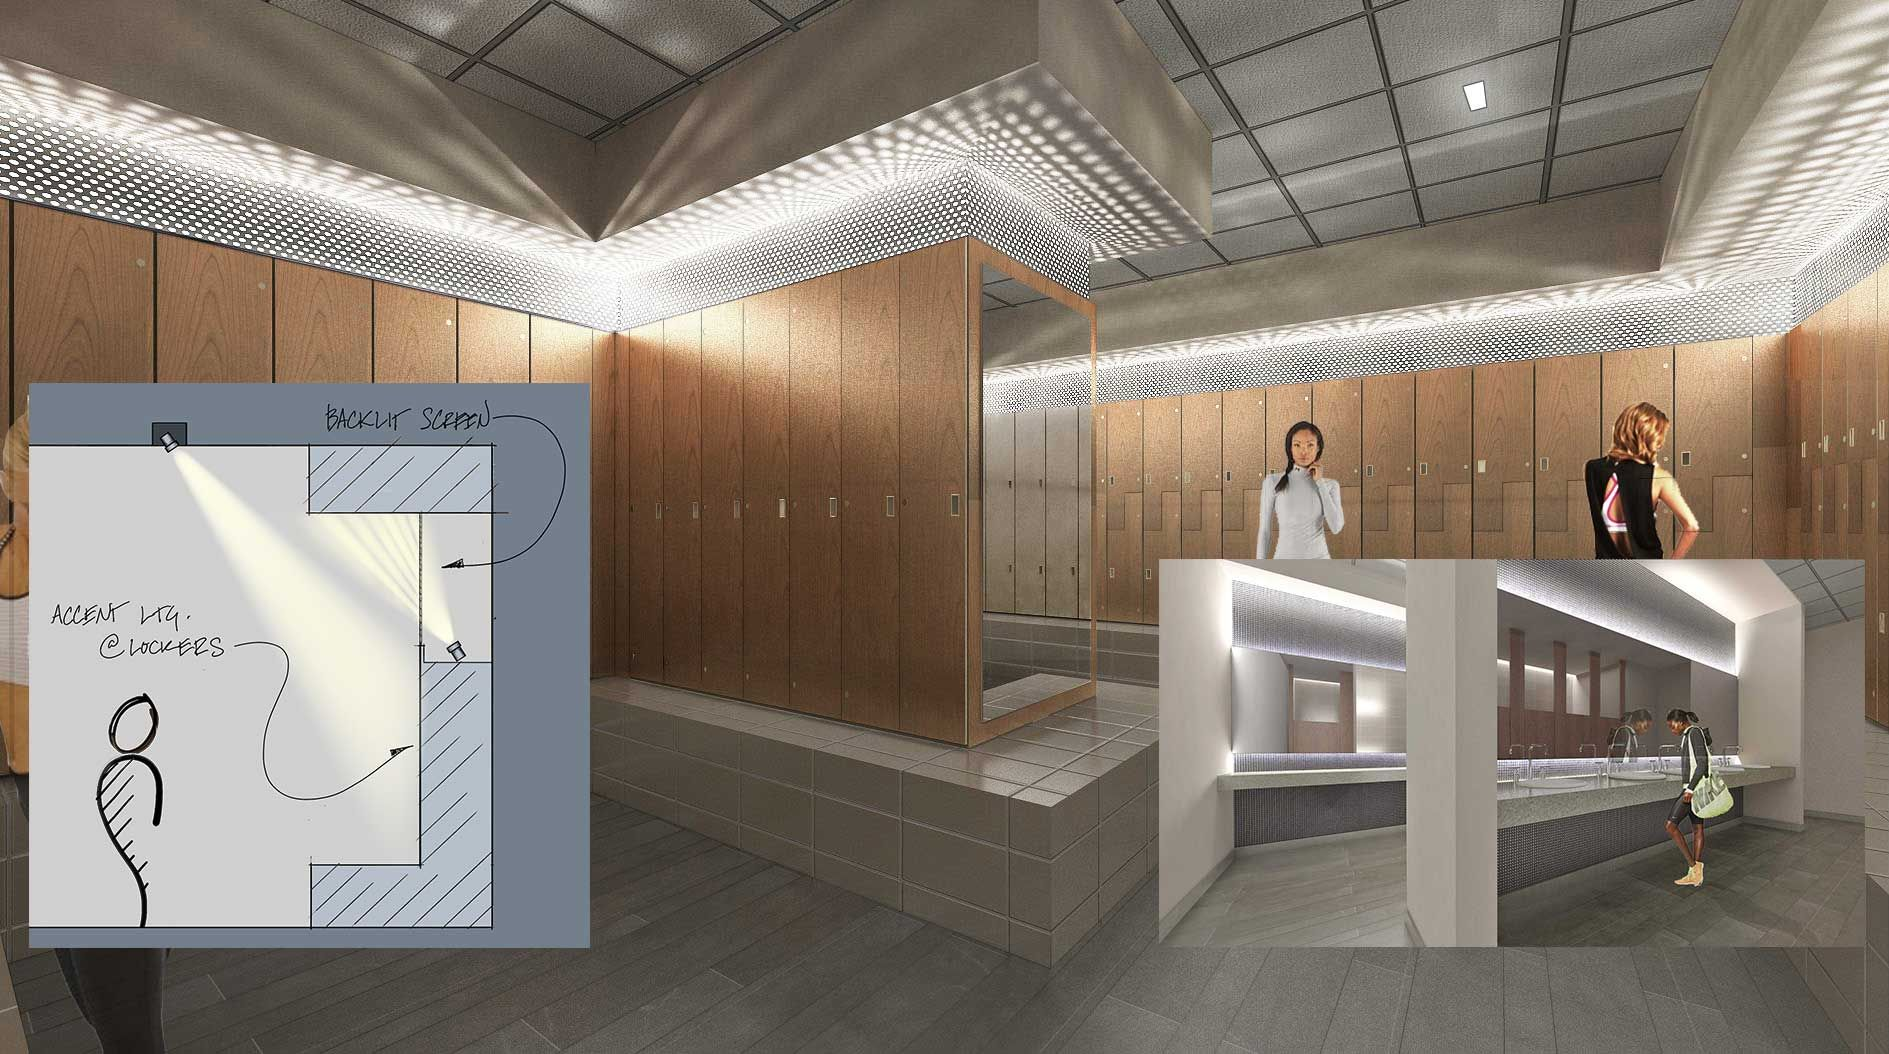 Locker Room Lighting Design L O C K E R R O O M